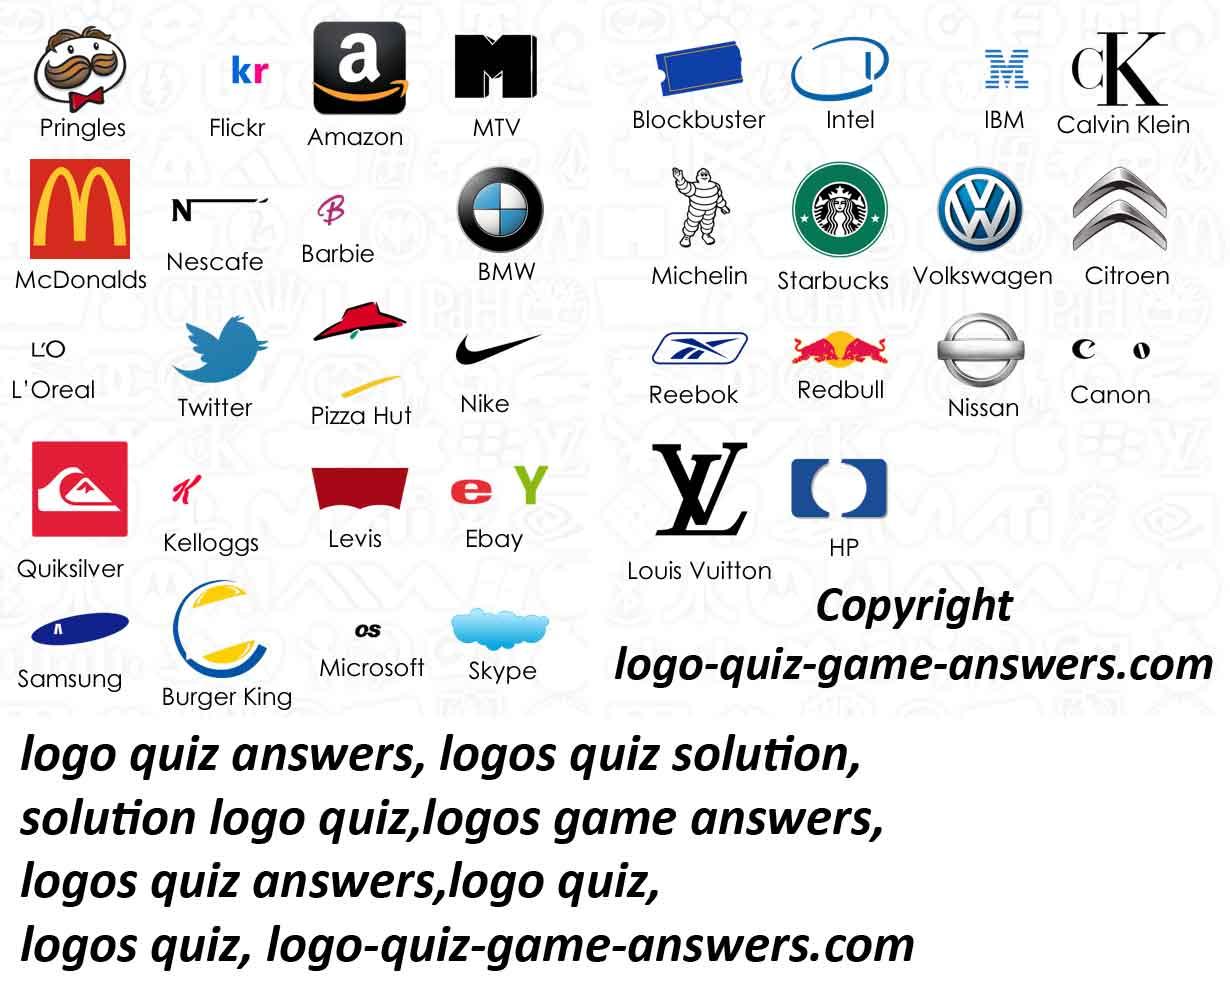 PZ C: logo quiz solution